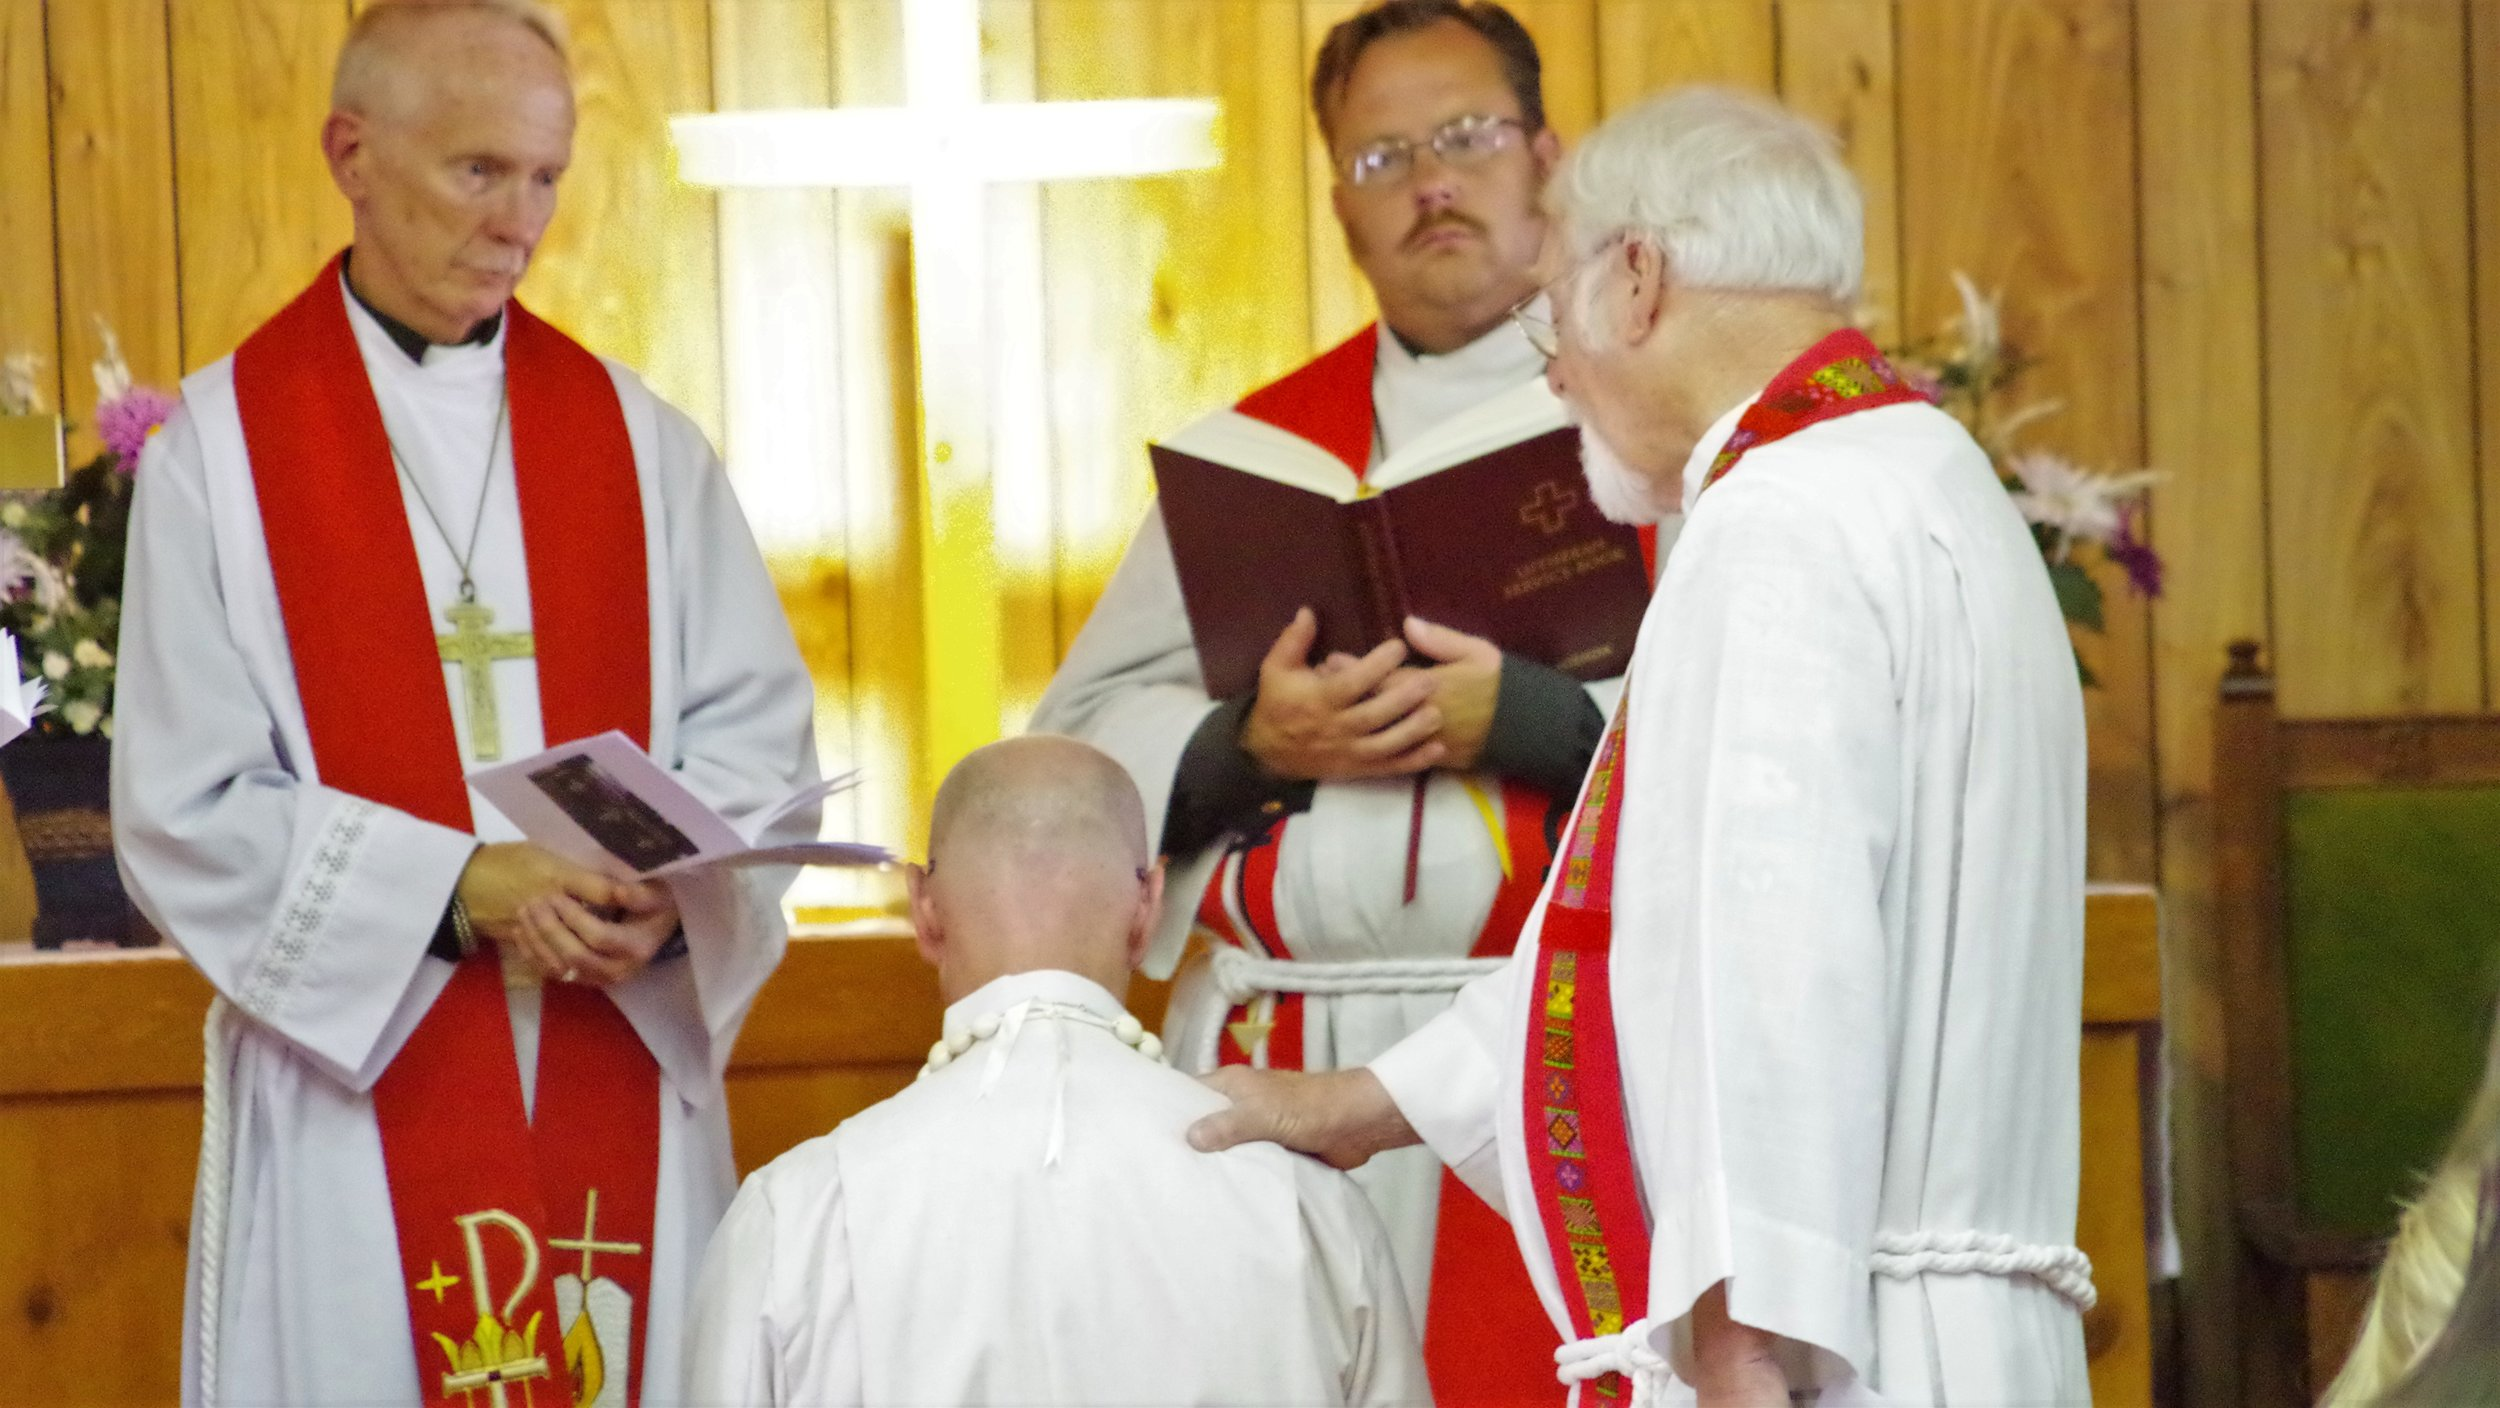 tim norton ordination shepherd of the valley lutheran church navajo new mexico lutheran indian ministries native